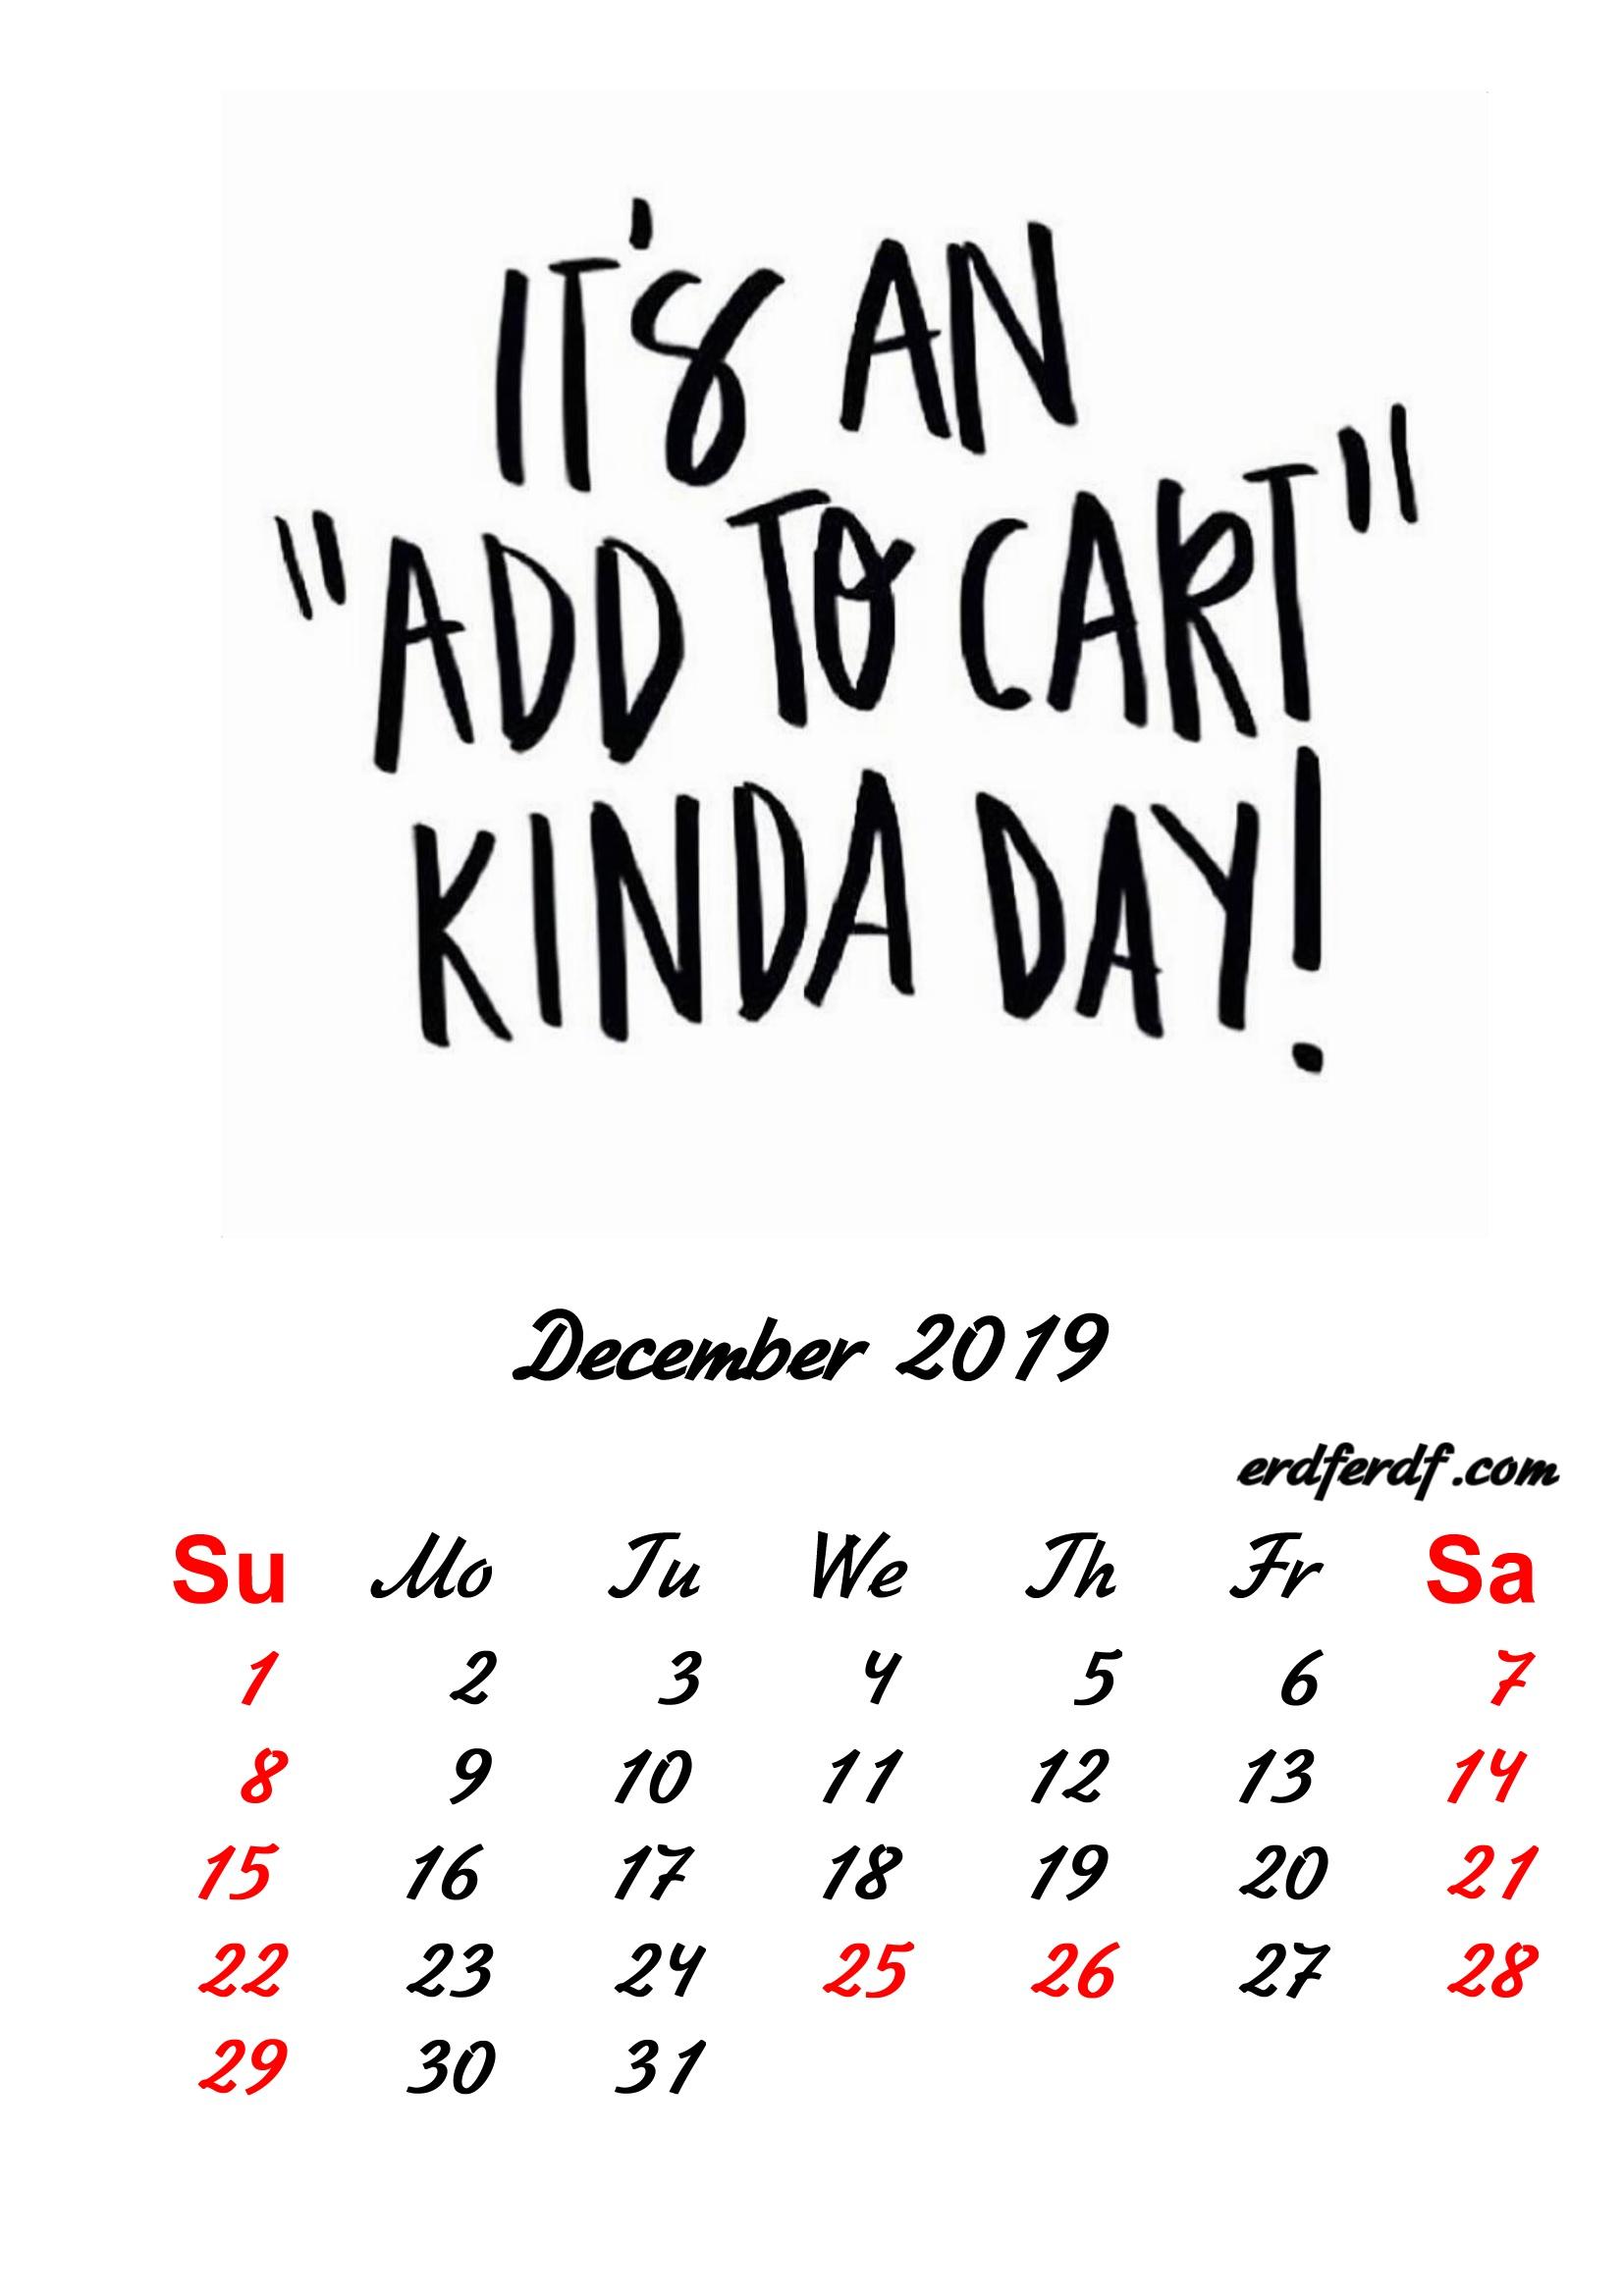 12 December 2019 Inspirational Quotes Pprintable Calendar